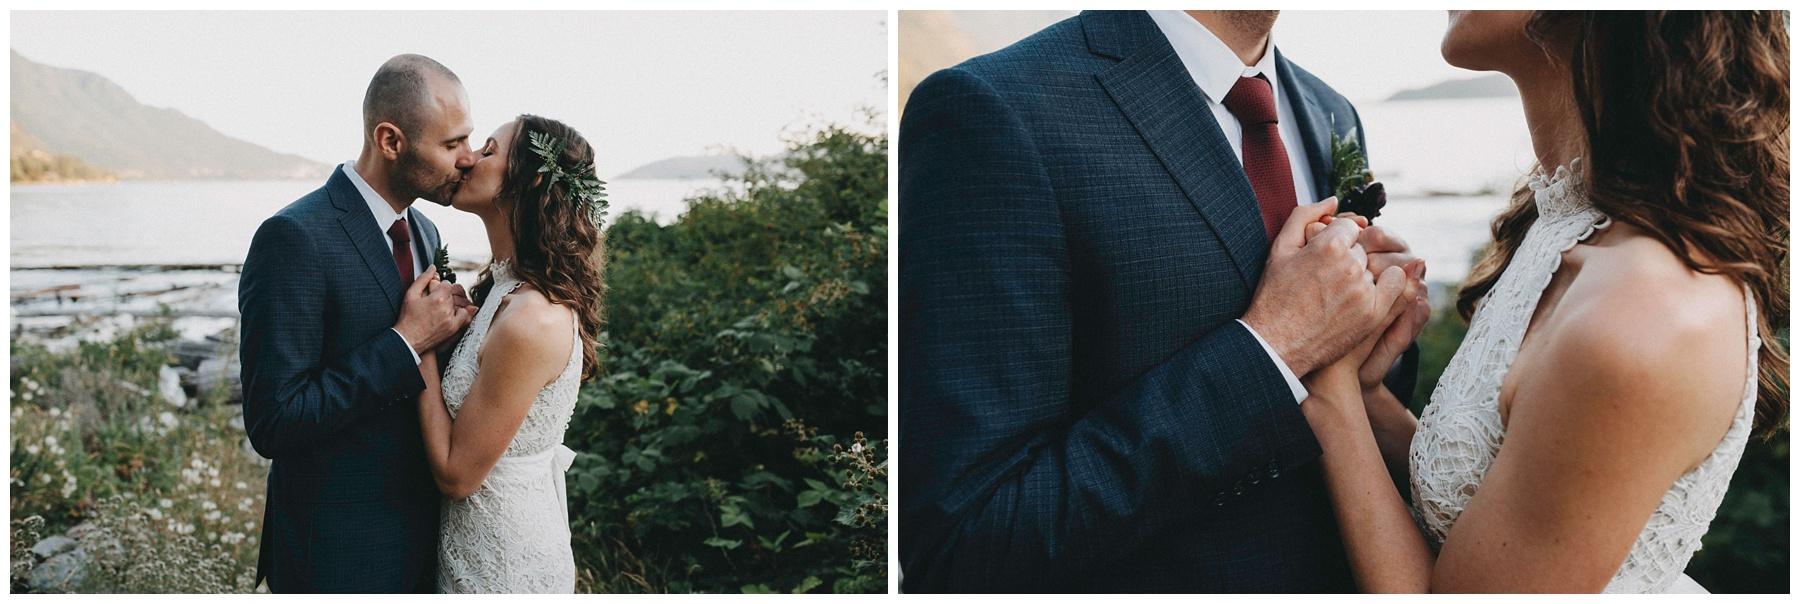 Vancouver intimate Wedding Photographer_0561.jpg